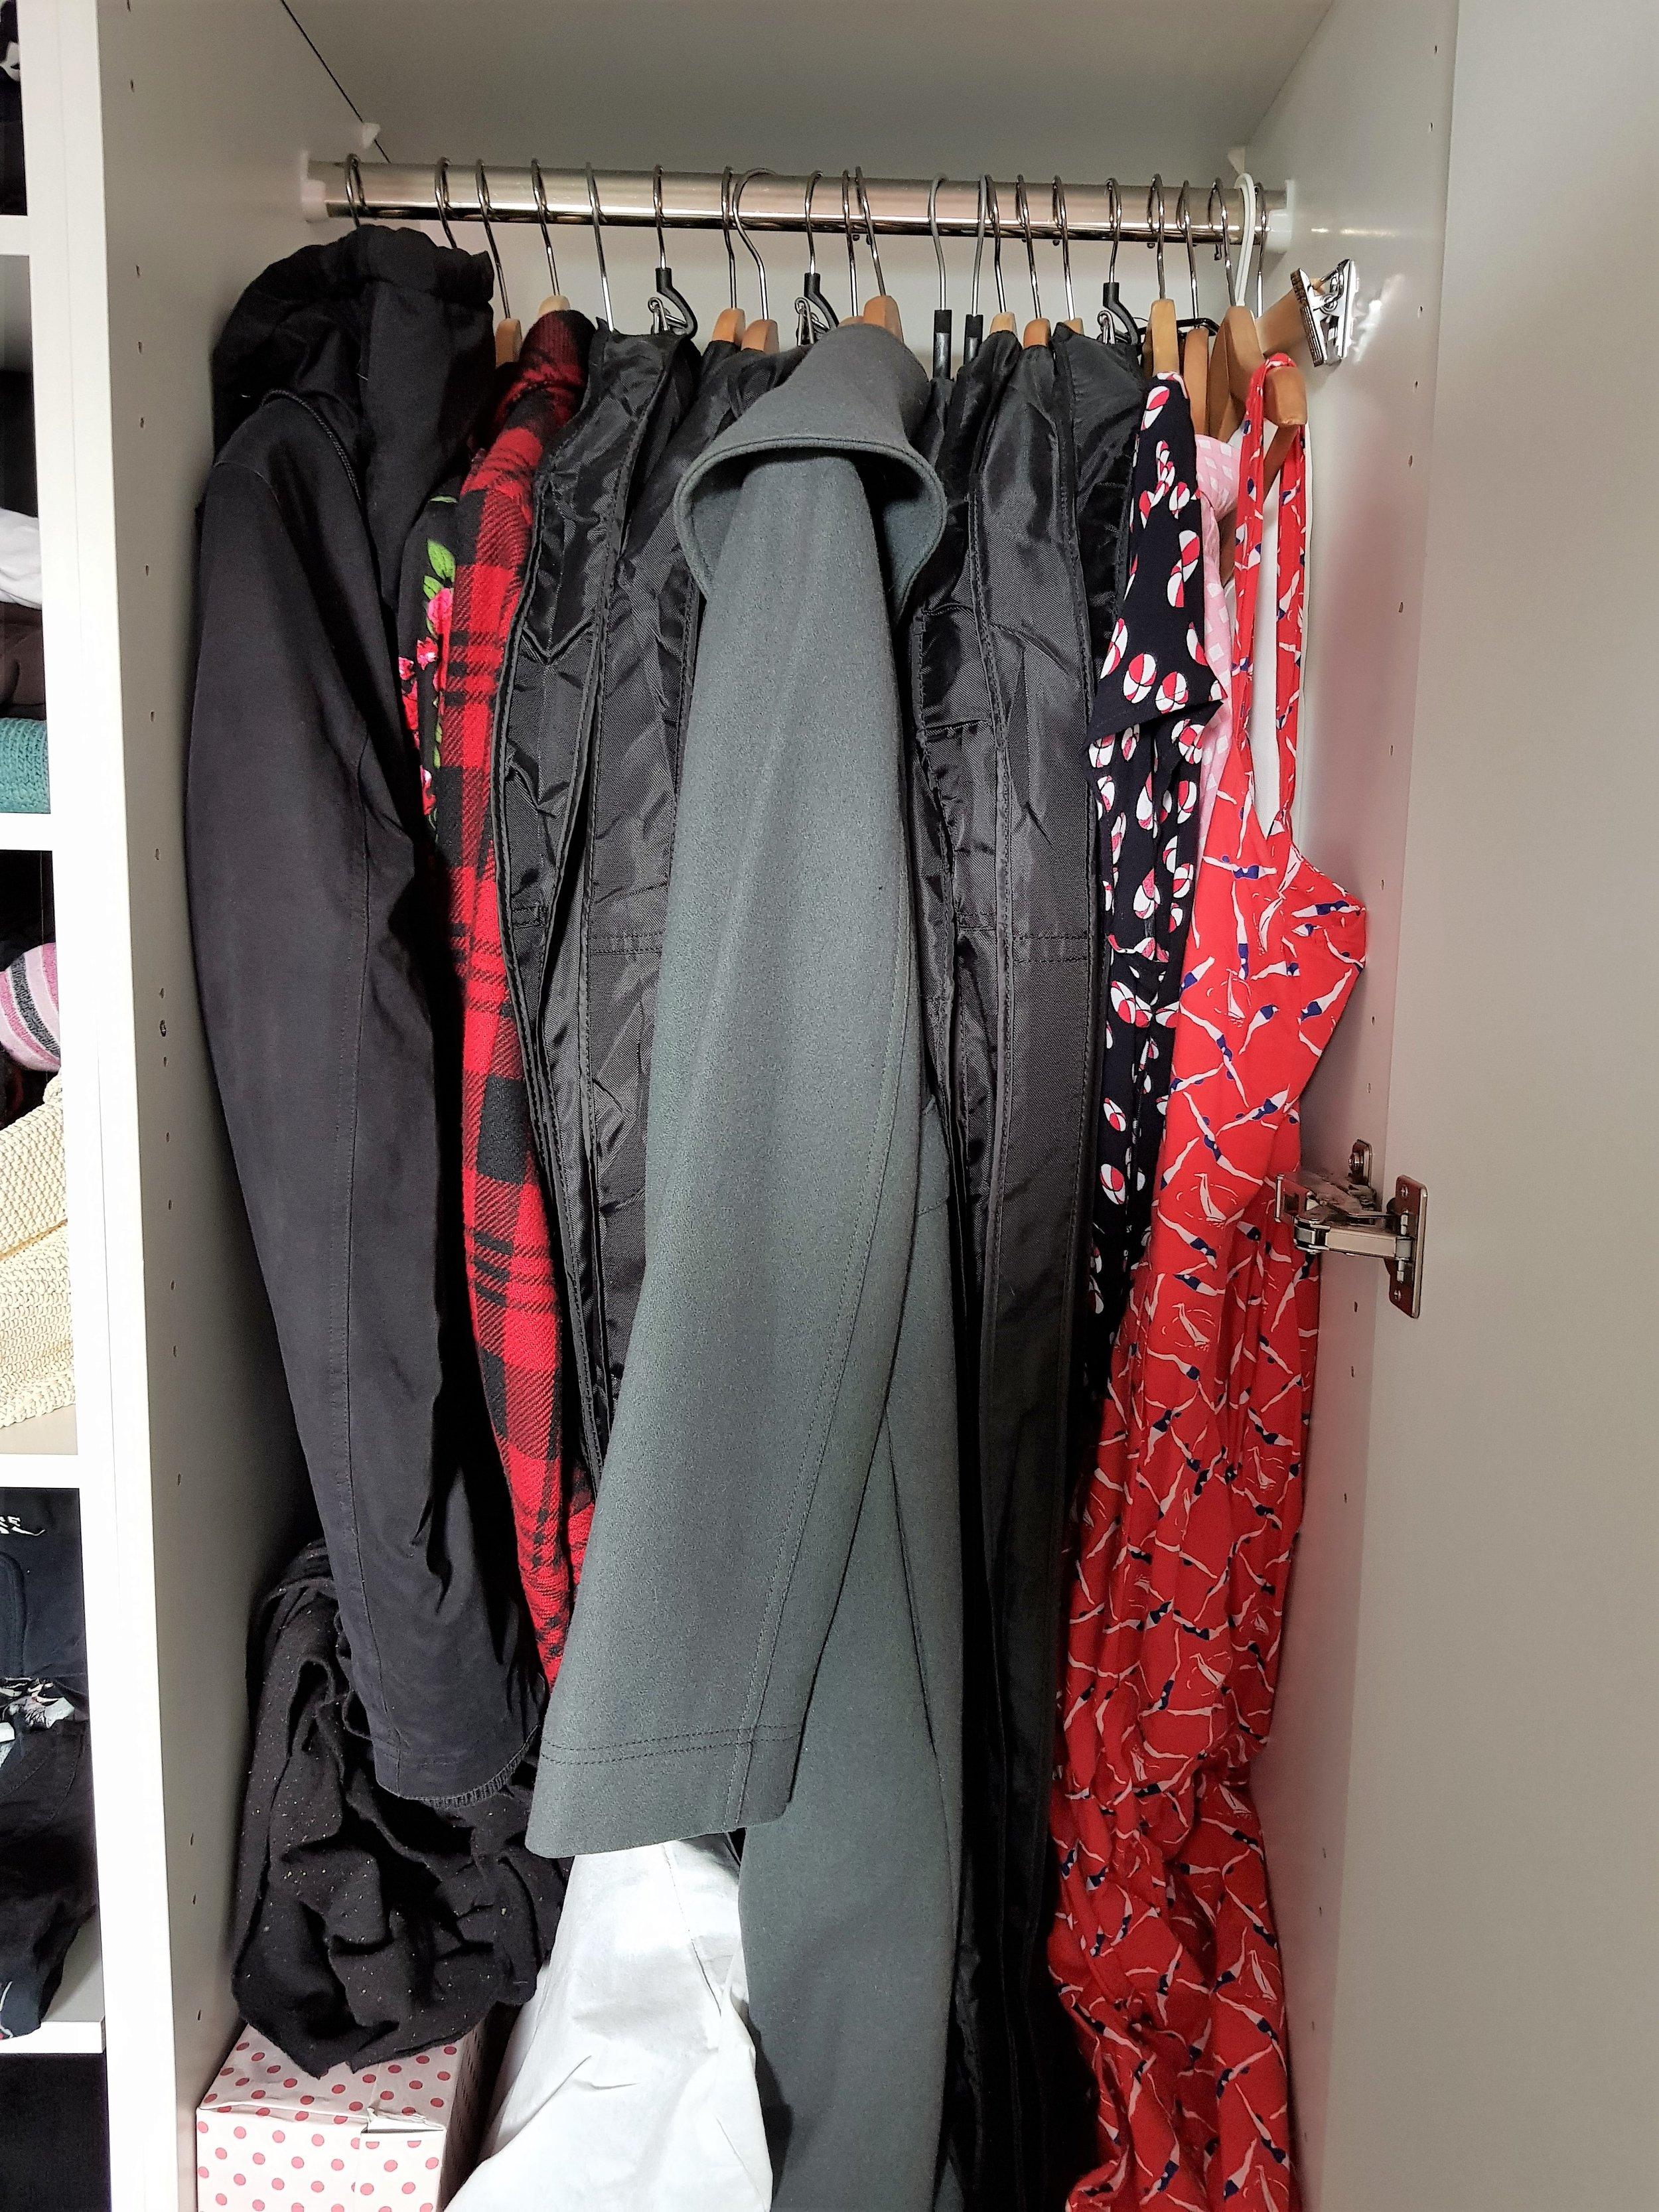 knitlish&sew blog_my closet before capsule wardrobe2.jpg